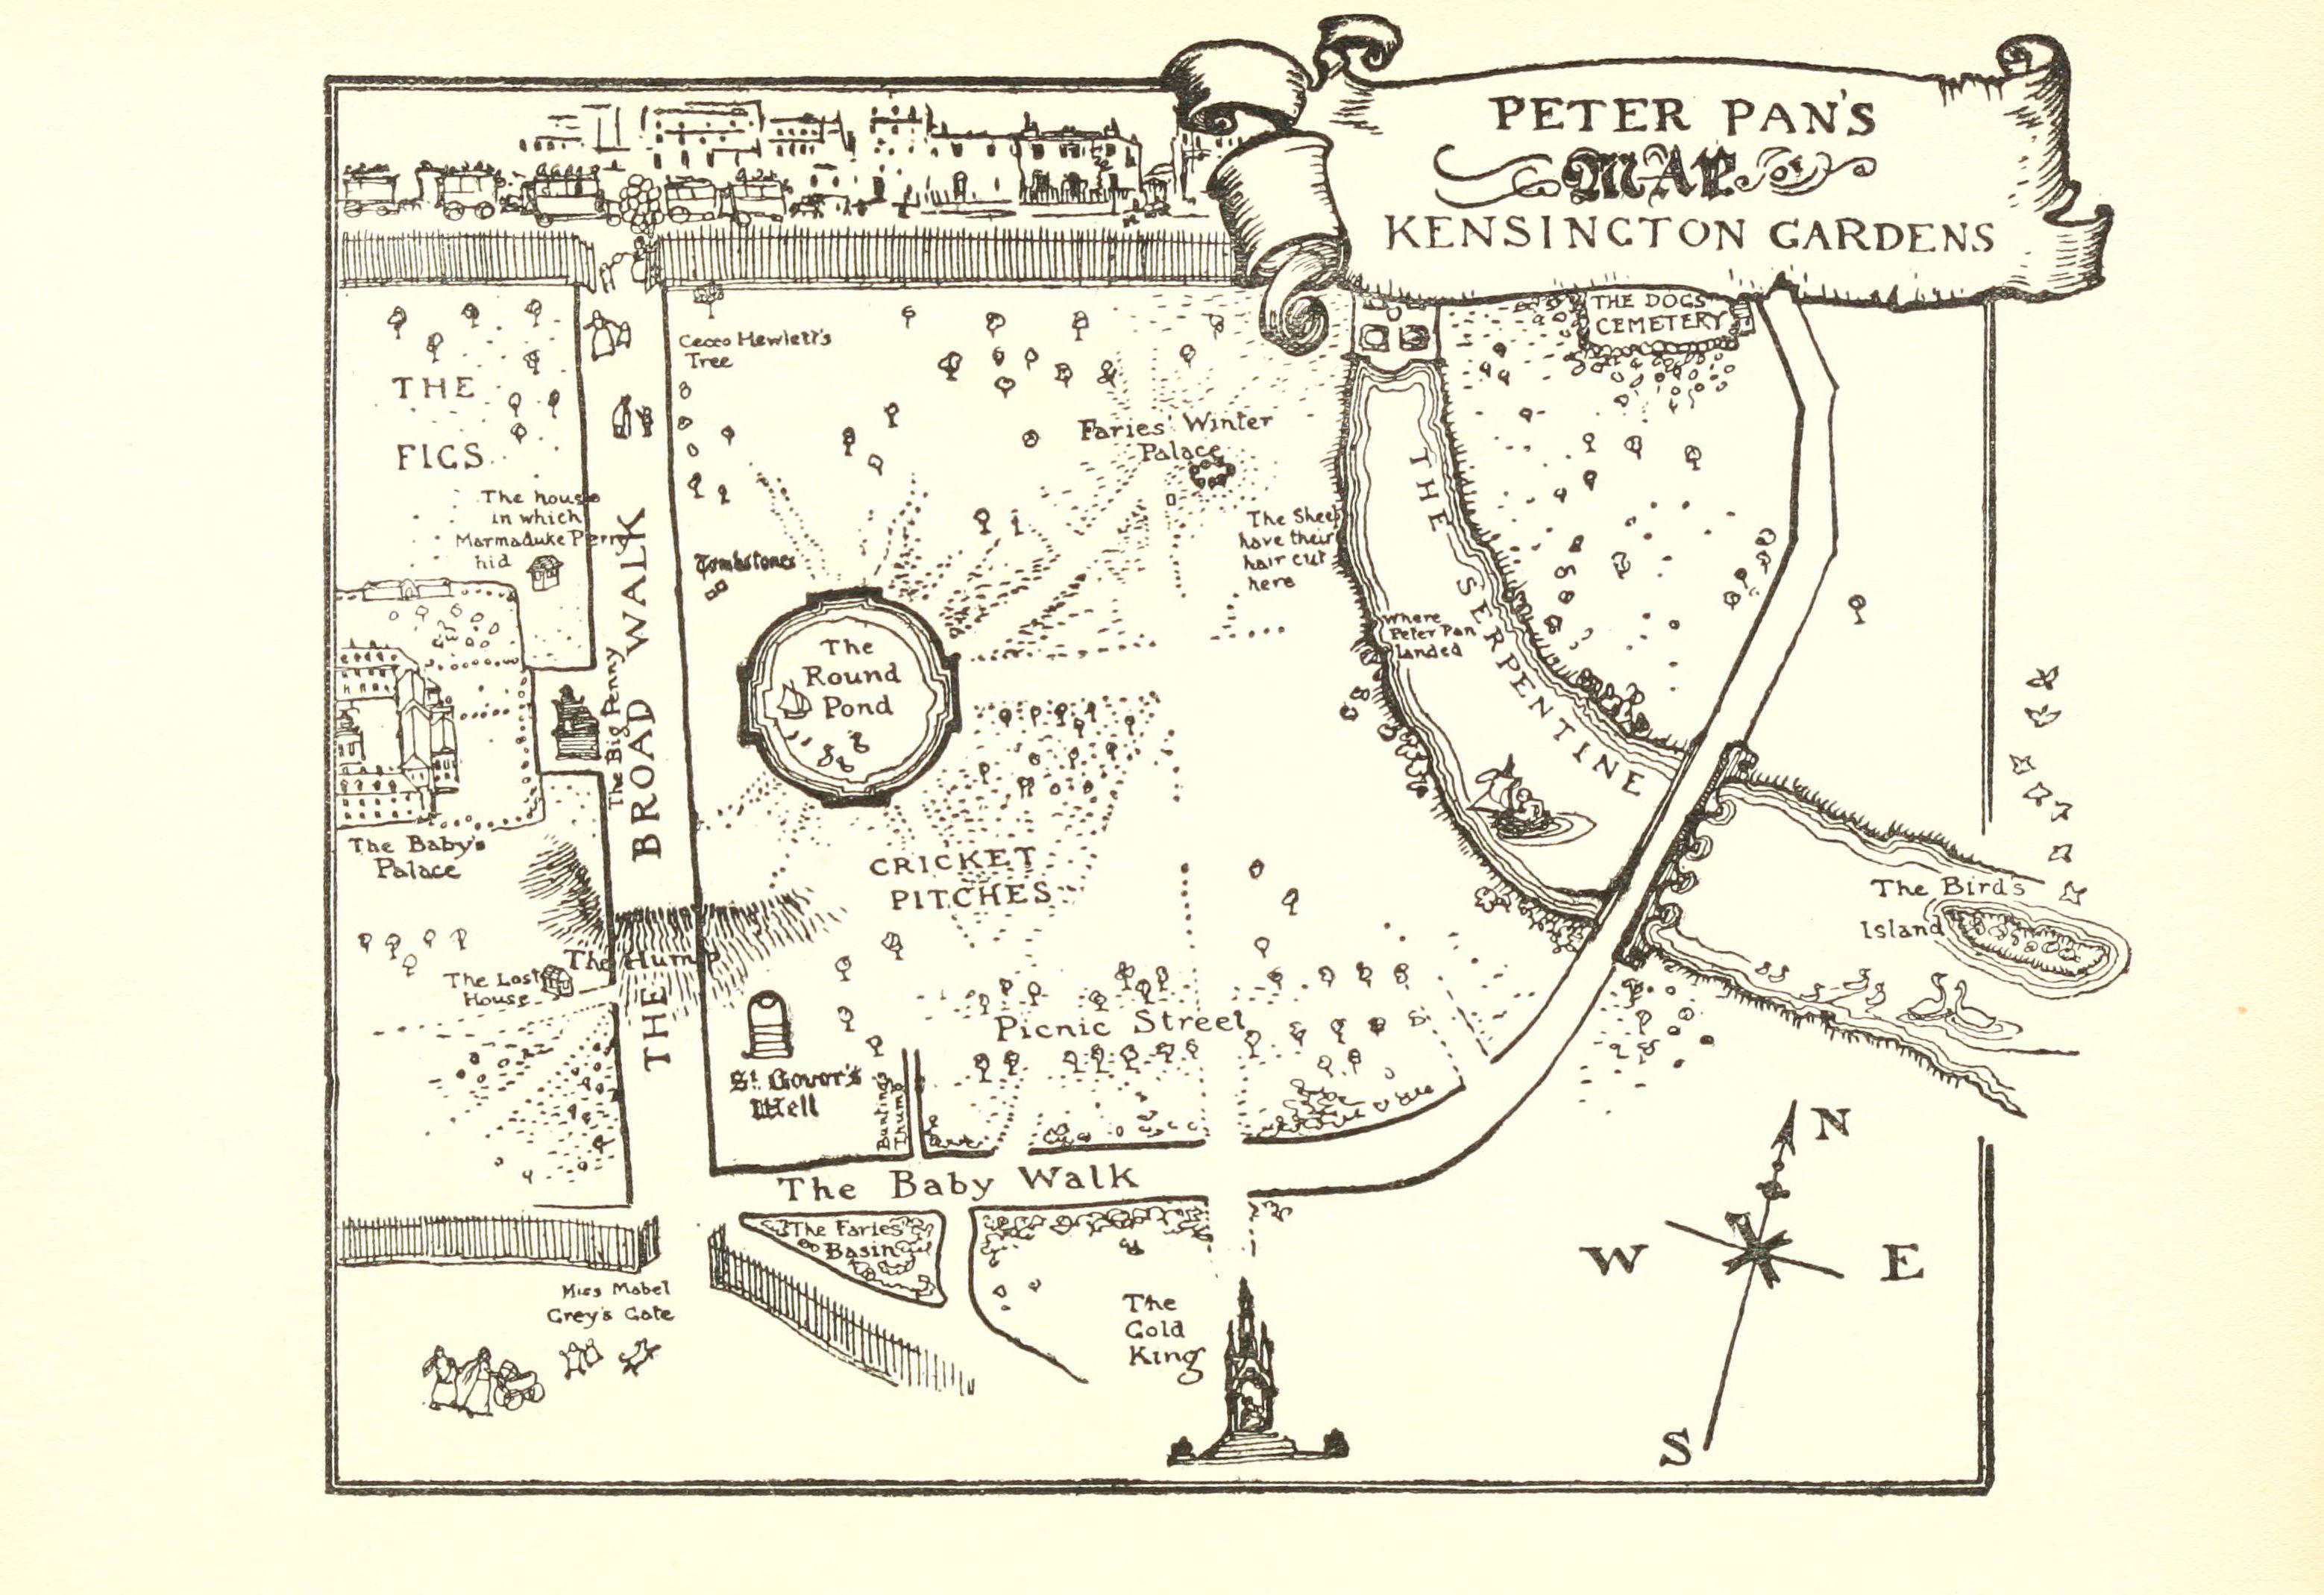 Kensington Gardens Landscape Notes